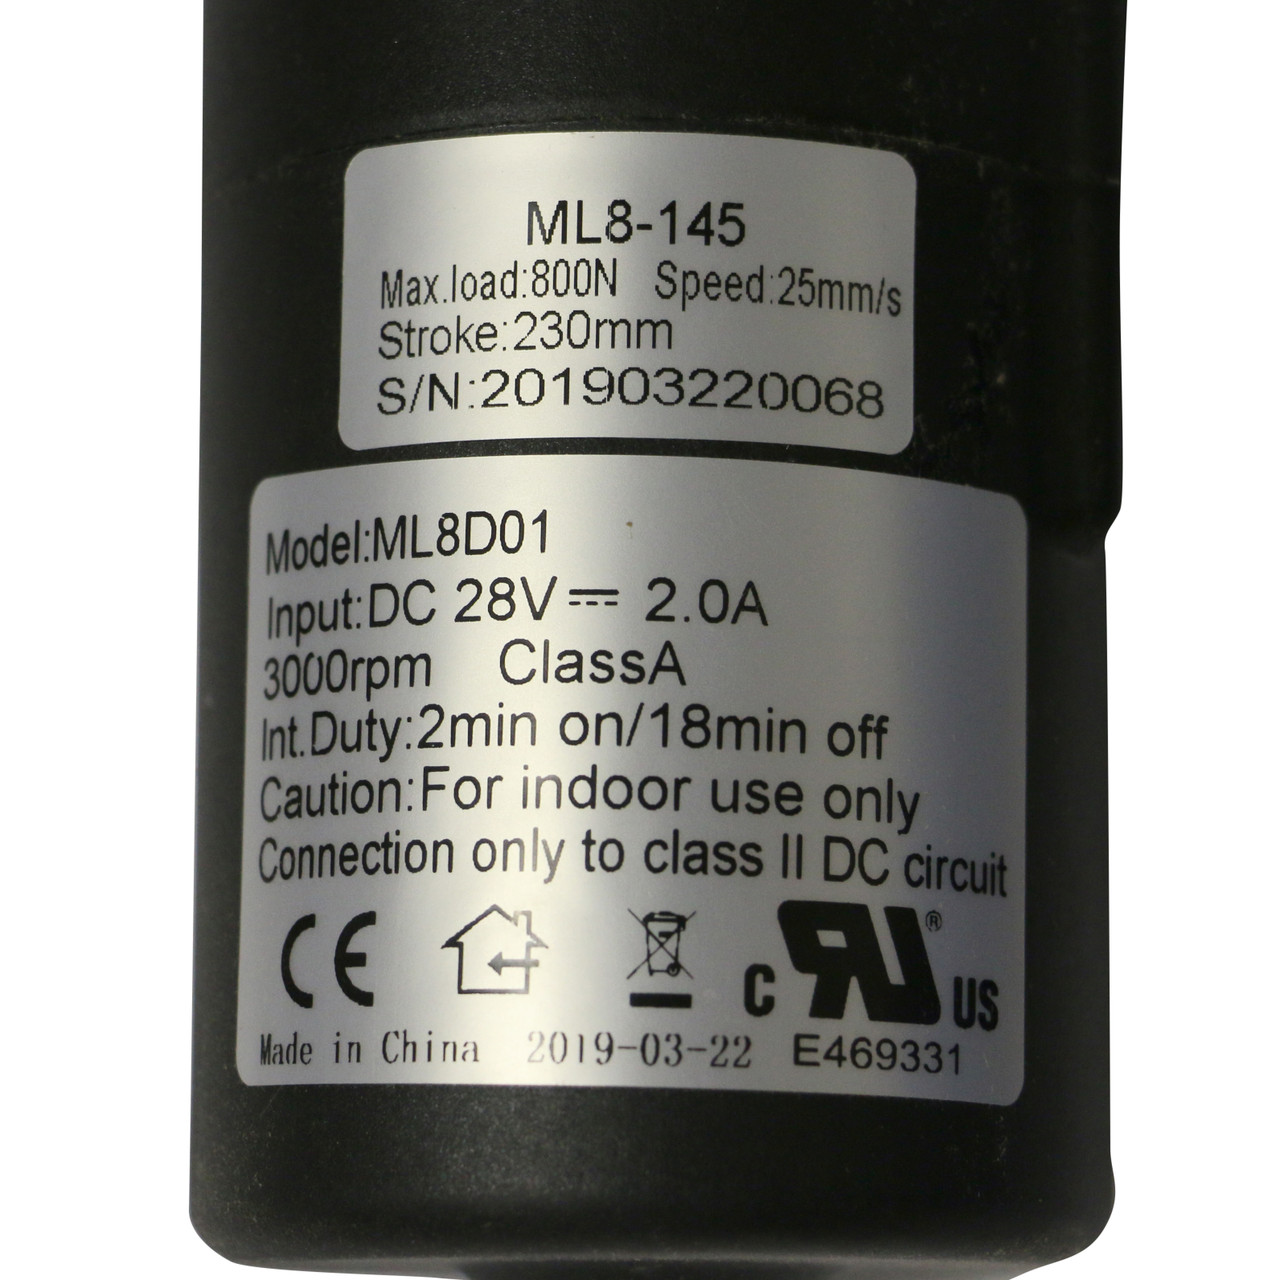 ML8-145, 230mm Stroke, 800N Max Load, DC 28V, ML8-145